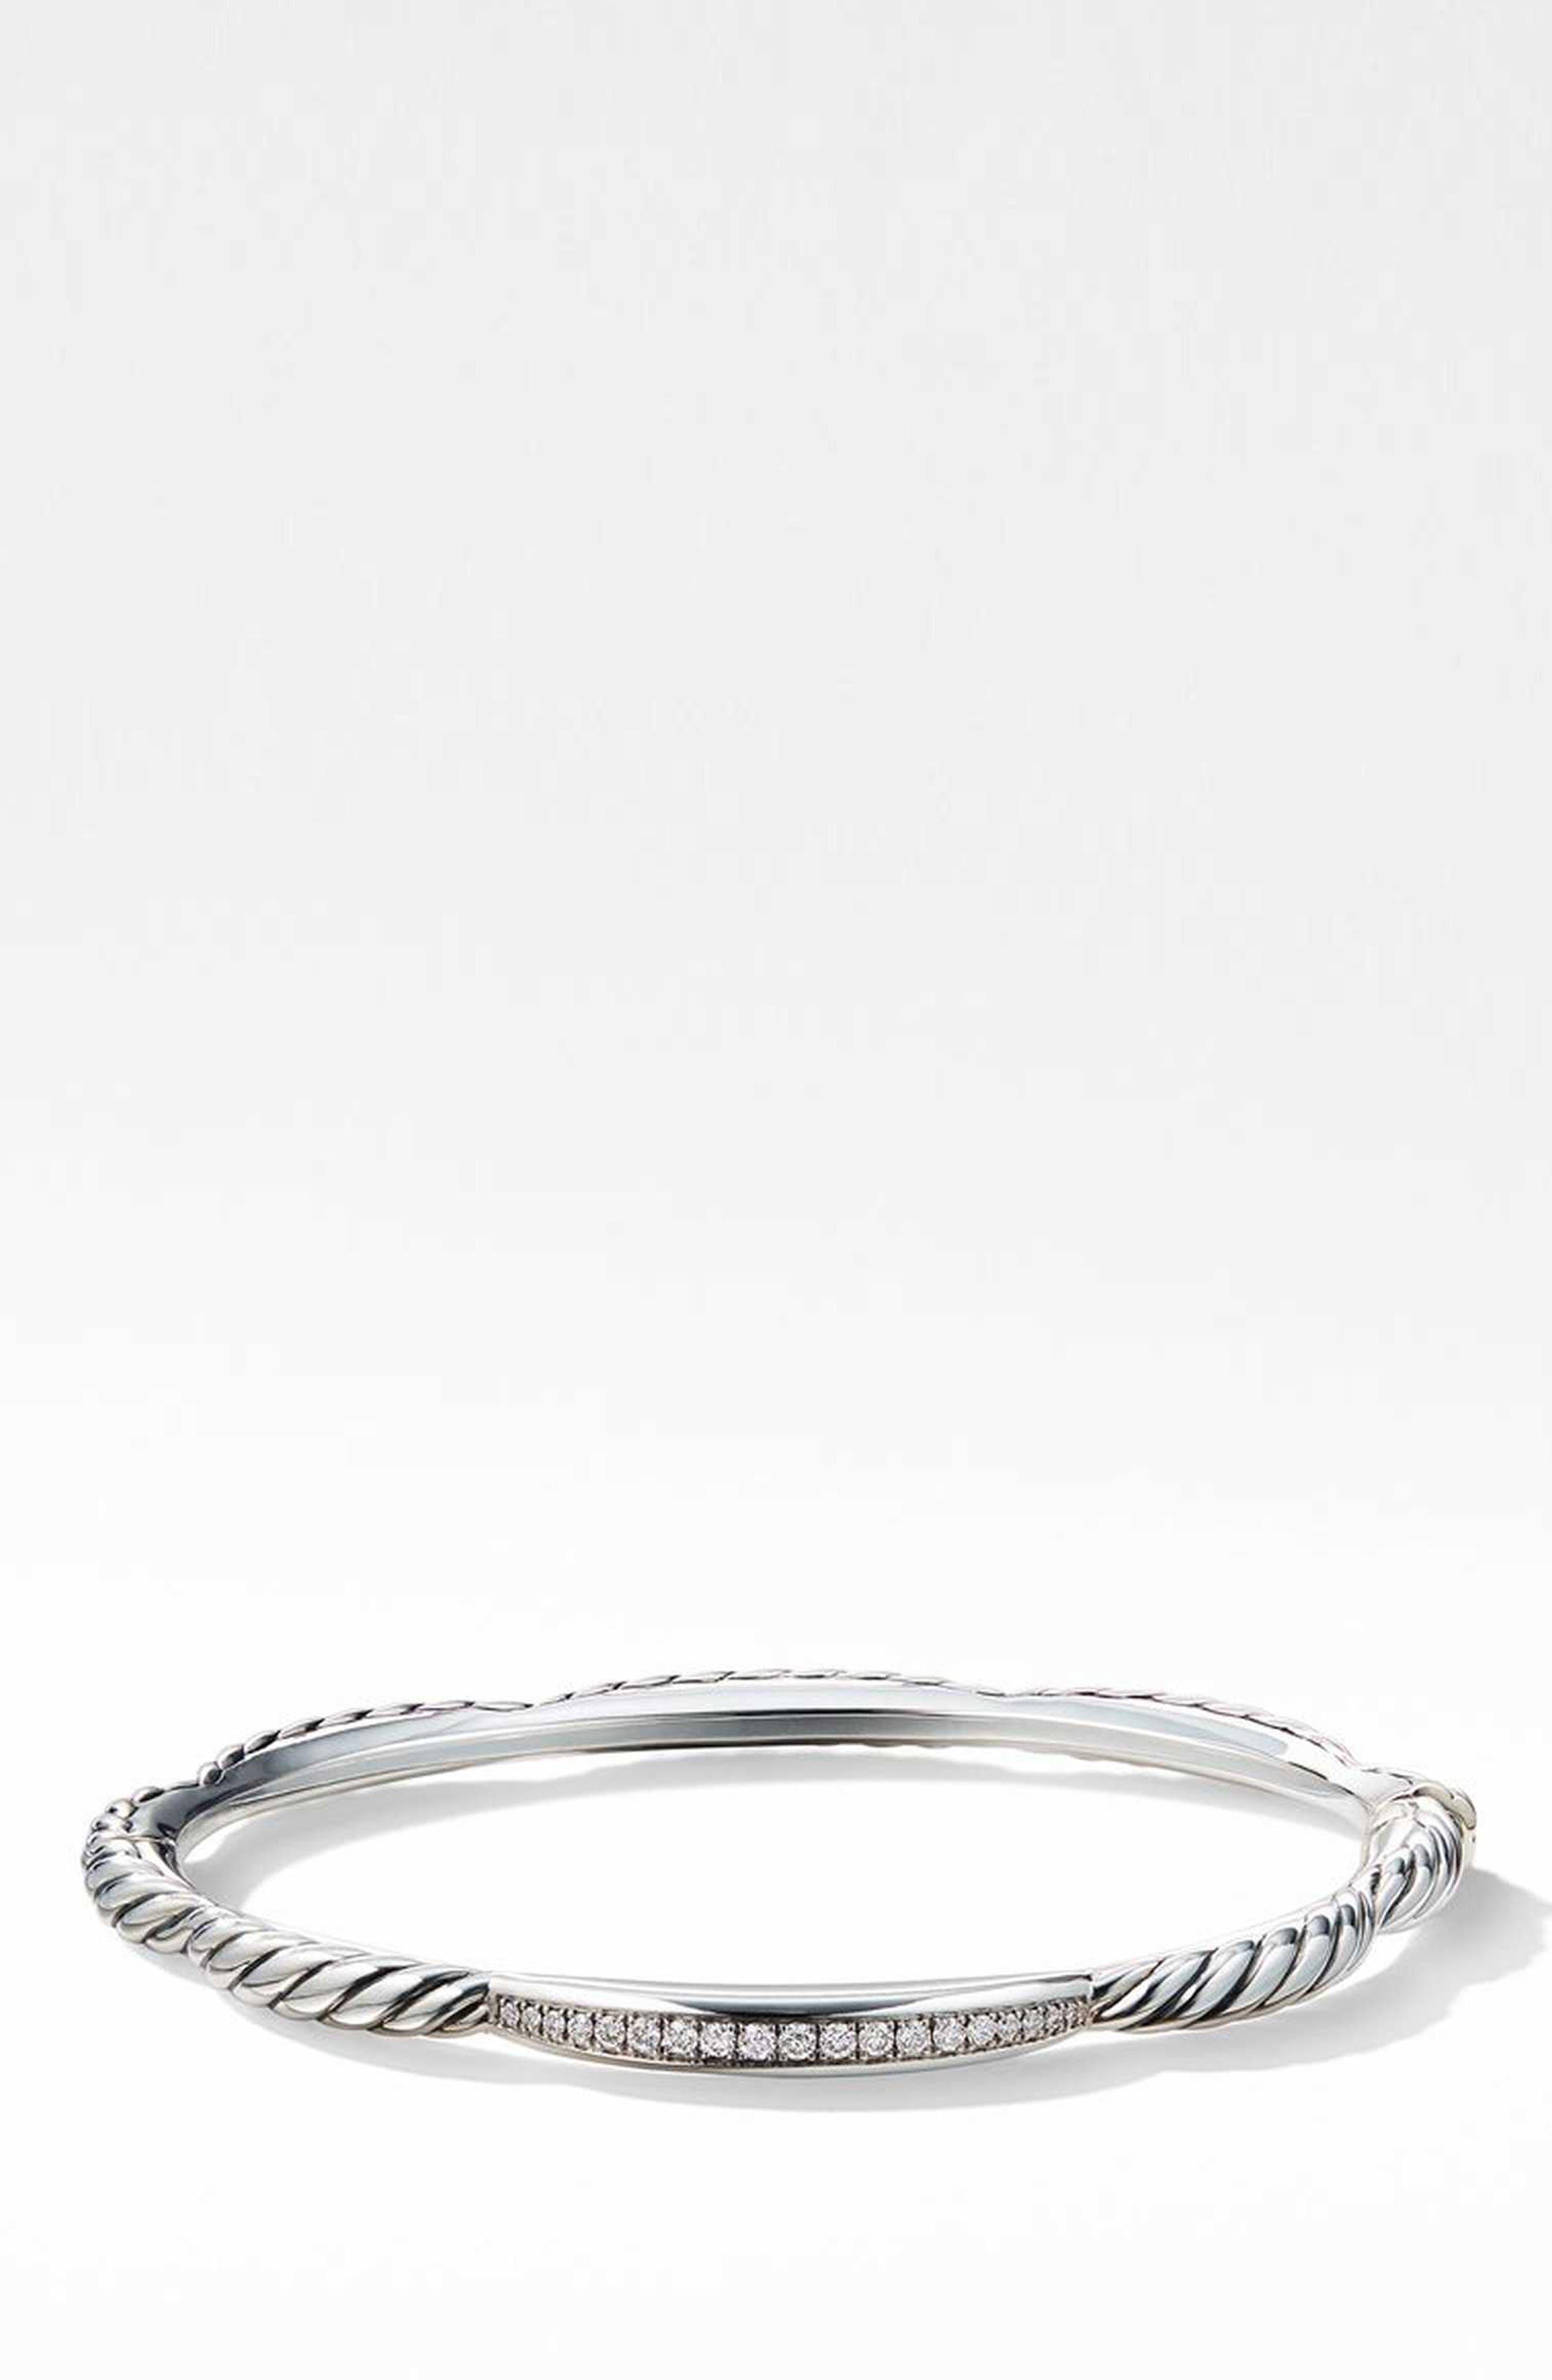 Tides Single Station Bracelet with Diamonds,                             Main thumbnail 1, color,                             STERLING SILVER/ DIAMOND